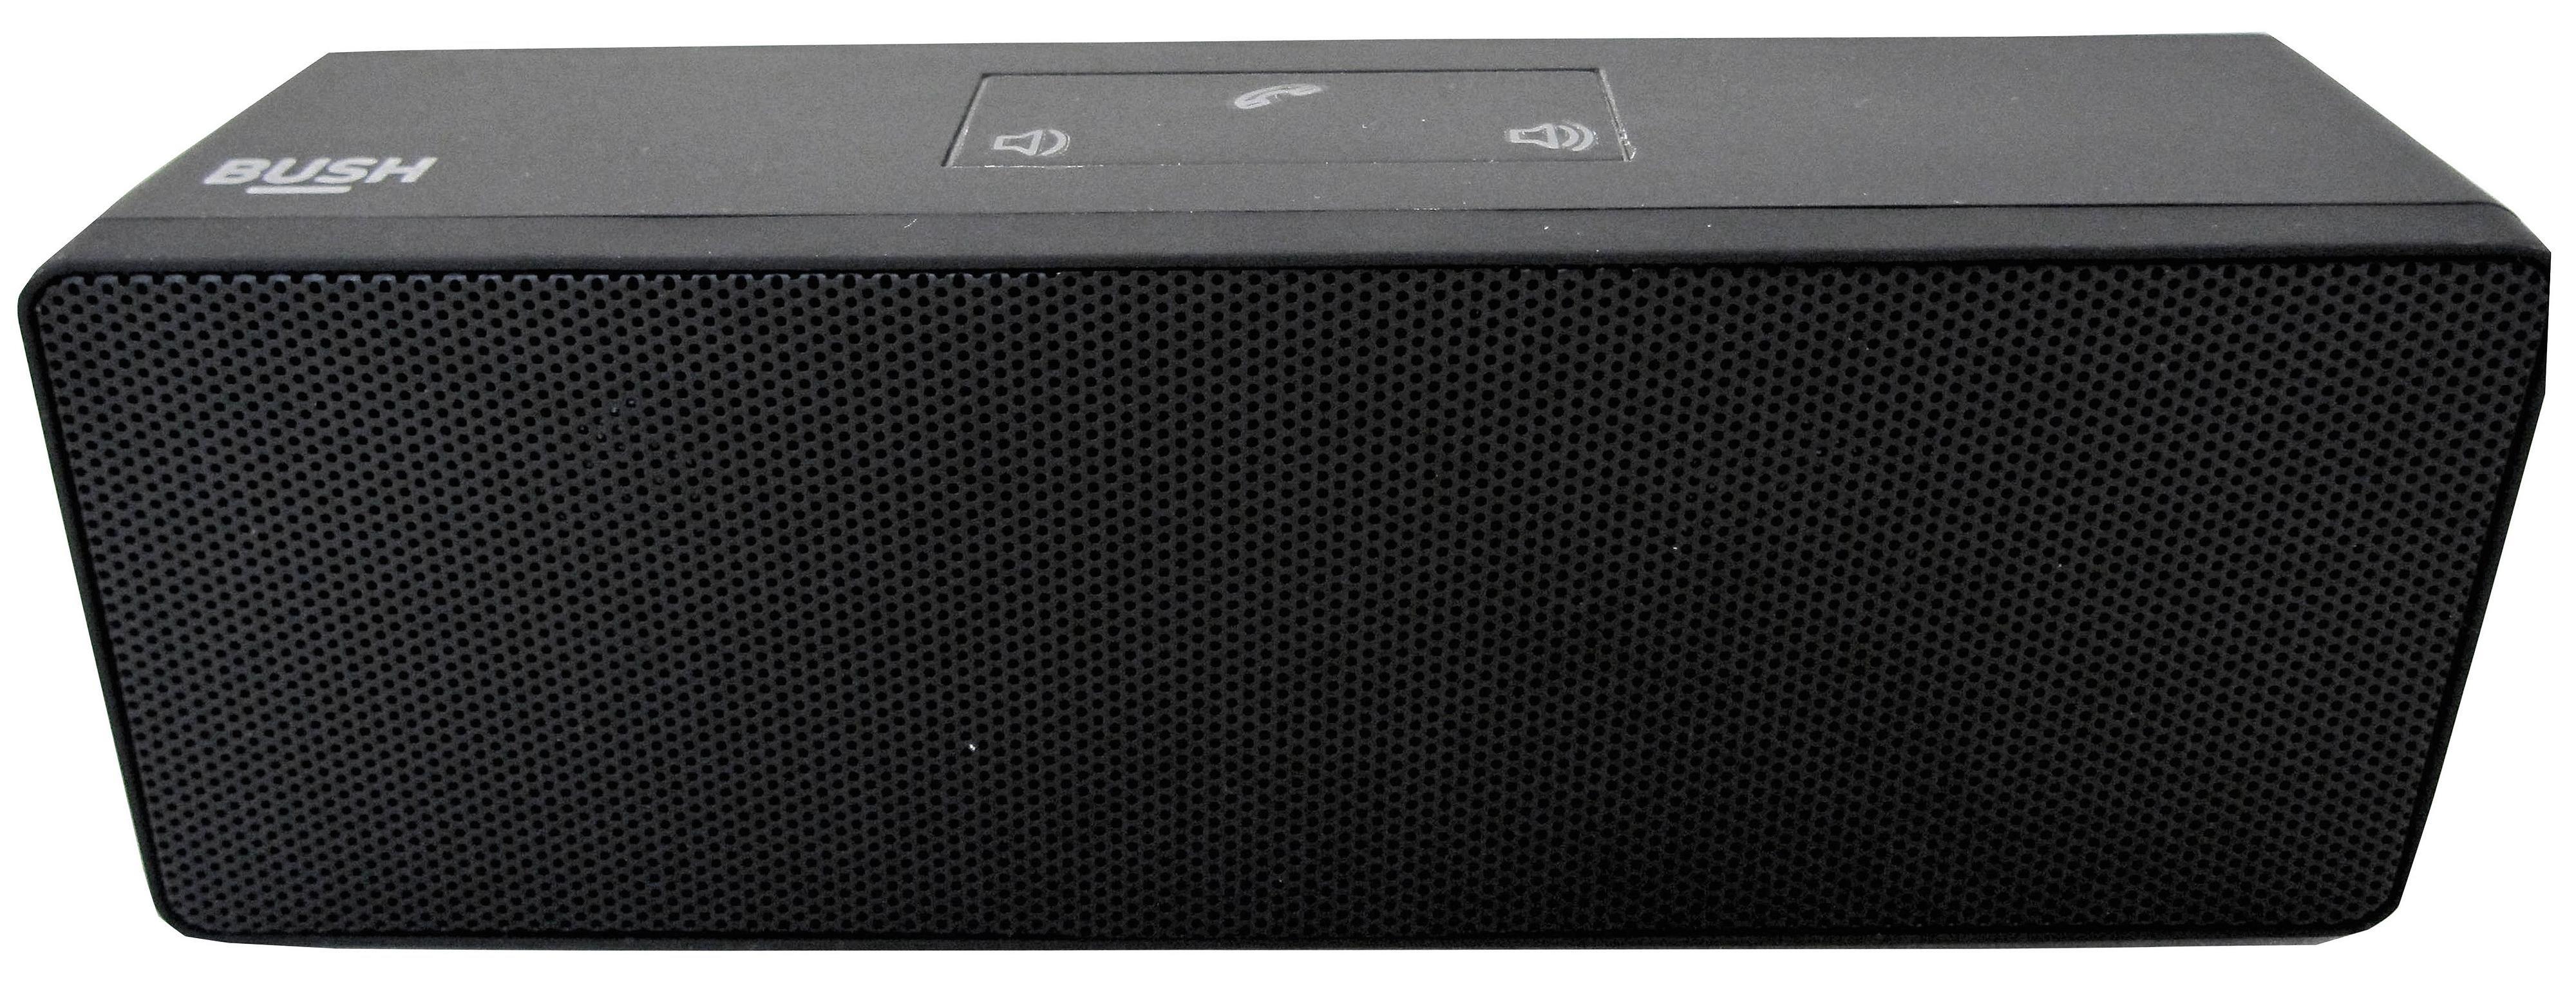 speakers. click to zoom speakers